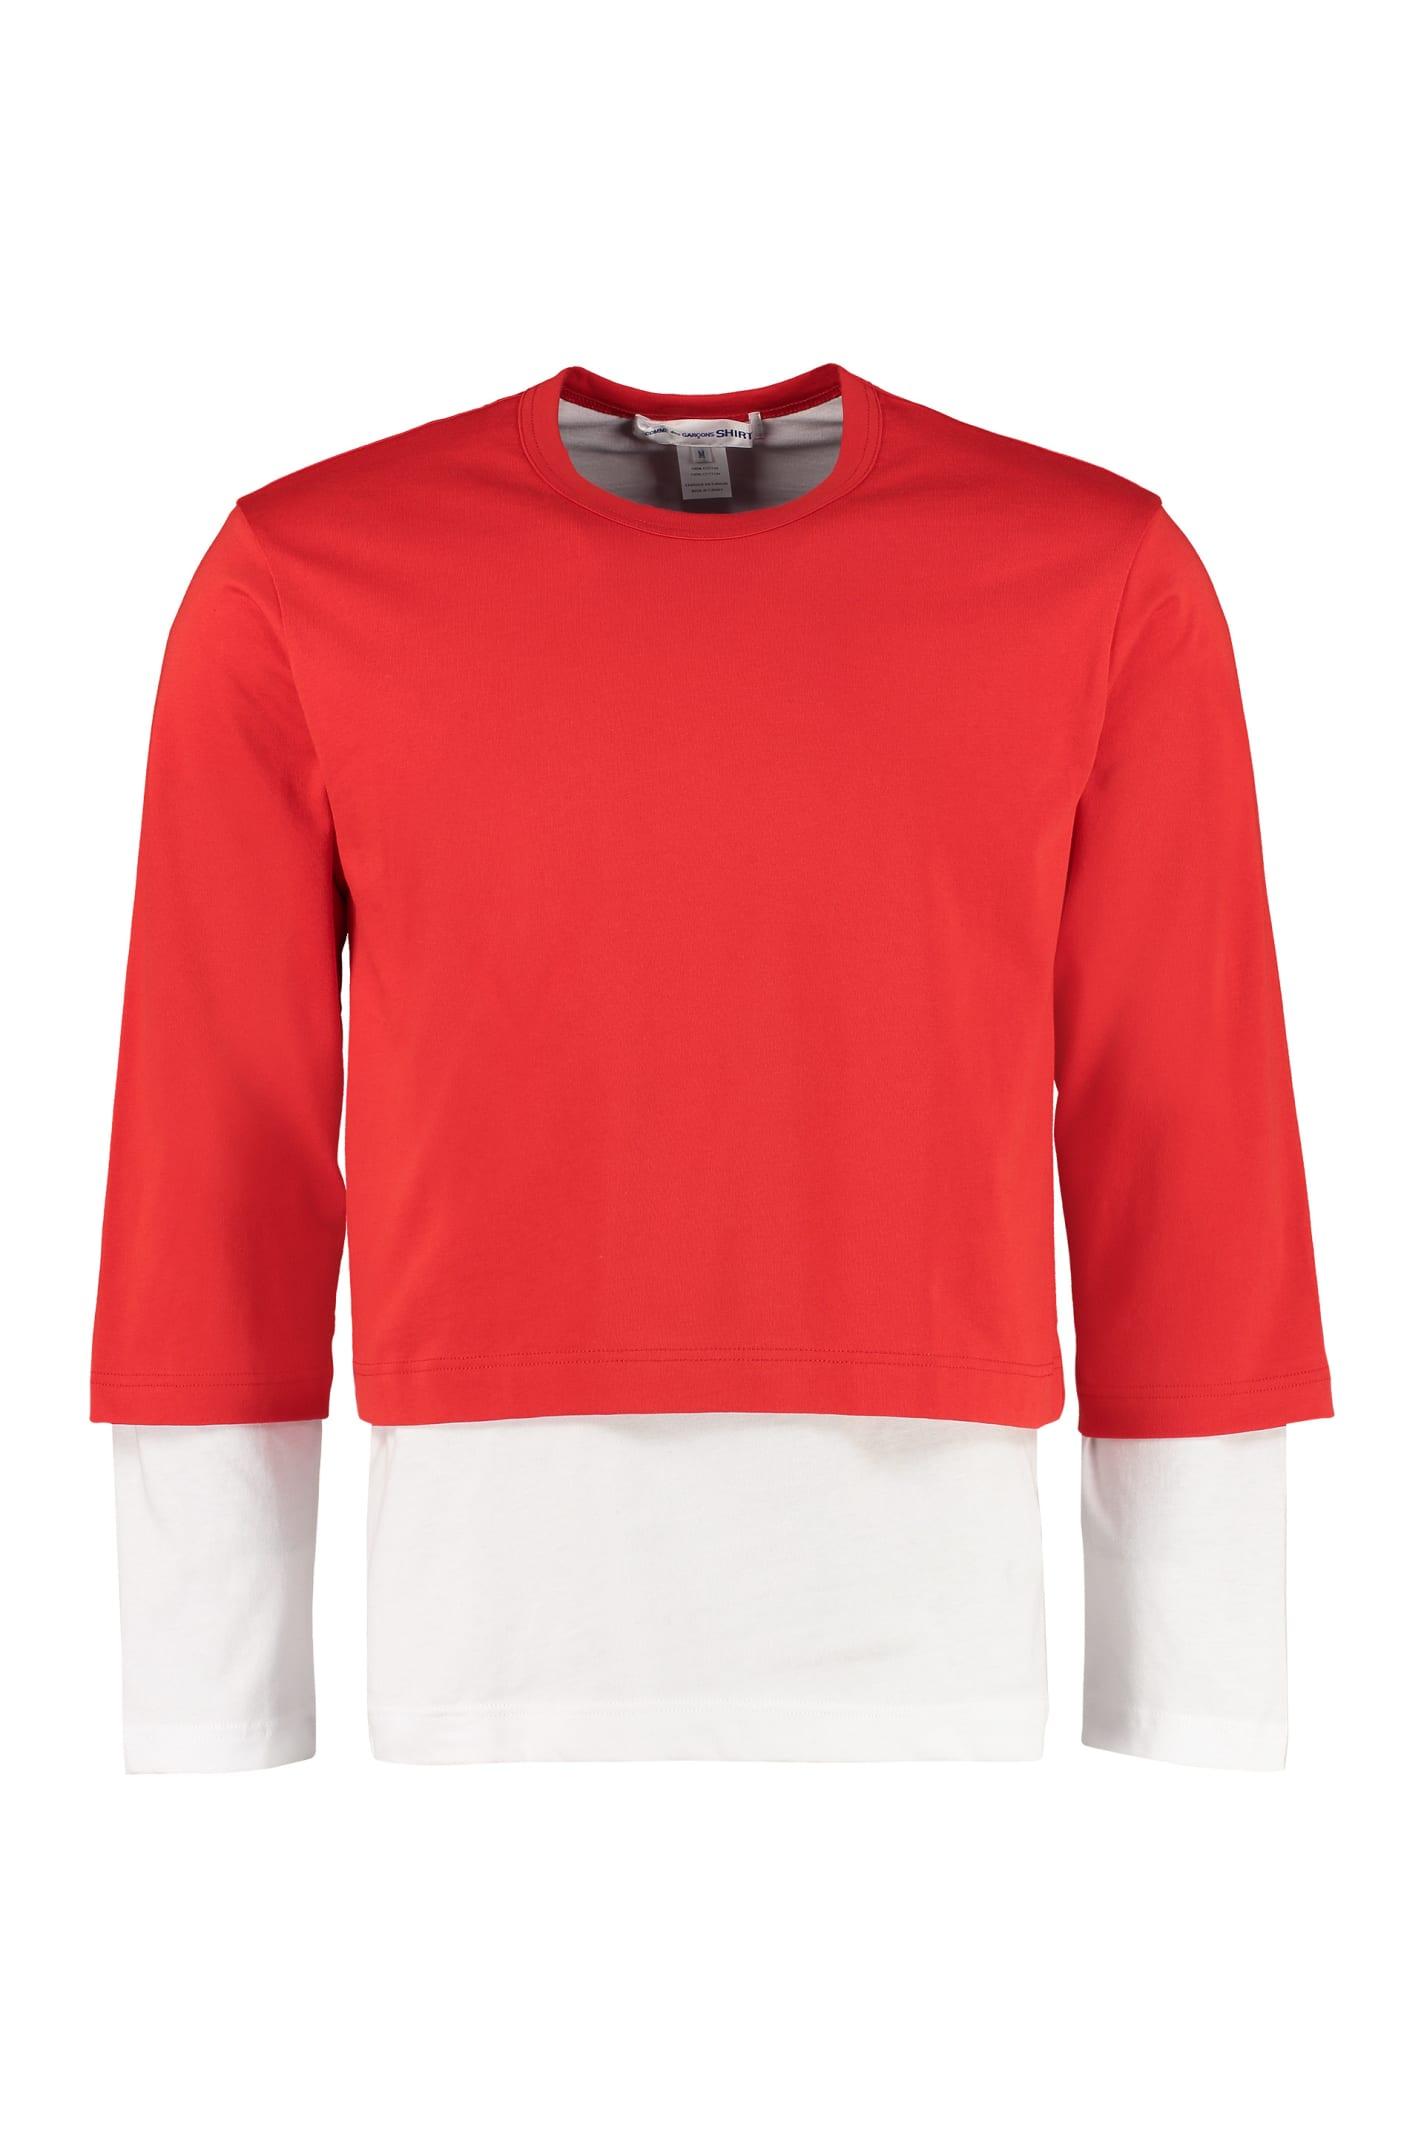 Comme des Garçons Shirt Cotton T-shirt